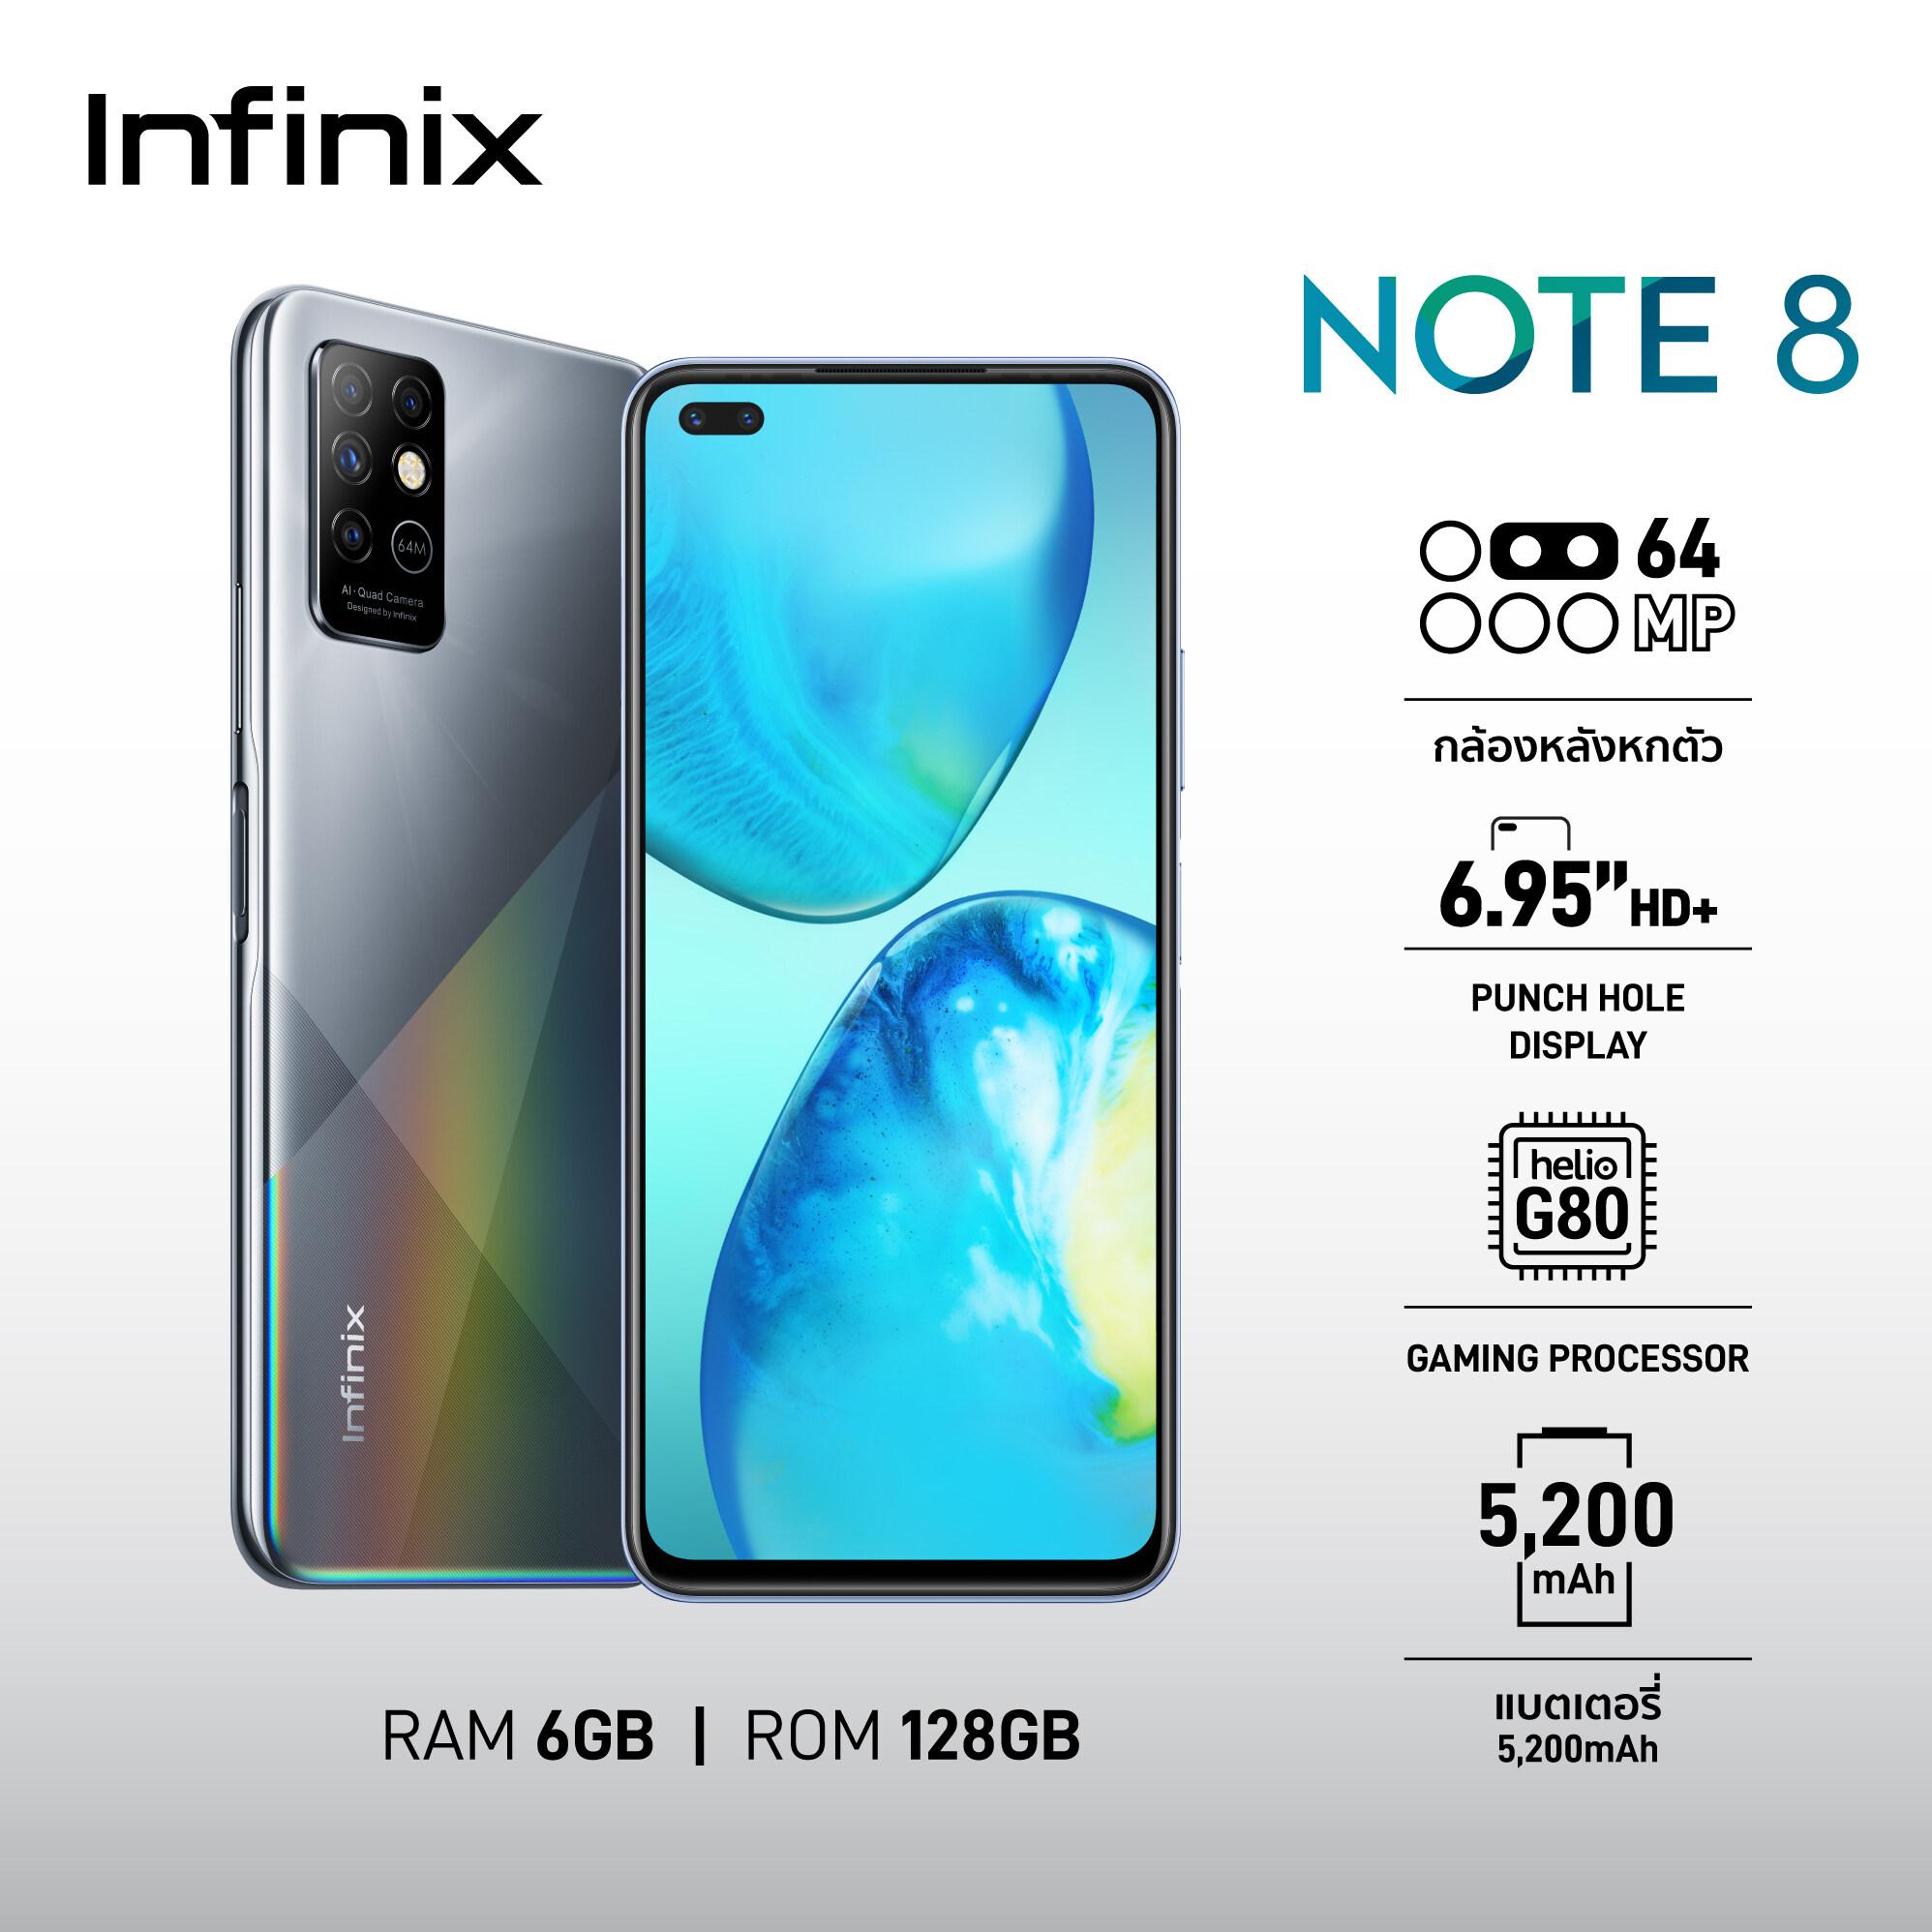 "Infinix Note 8 (6GB+128GB) จอกว้าง 6.95"" แบตฯ 5200 mAh กล้องหน้าคู่ กล้องหลัง 4 ตัว คมชัด 64MP พร้อมเทคโนโลยีชาร์จไว 18W"